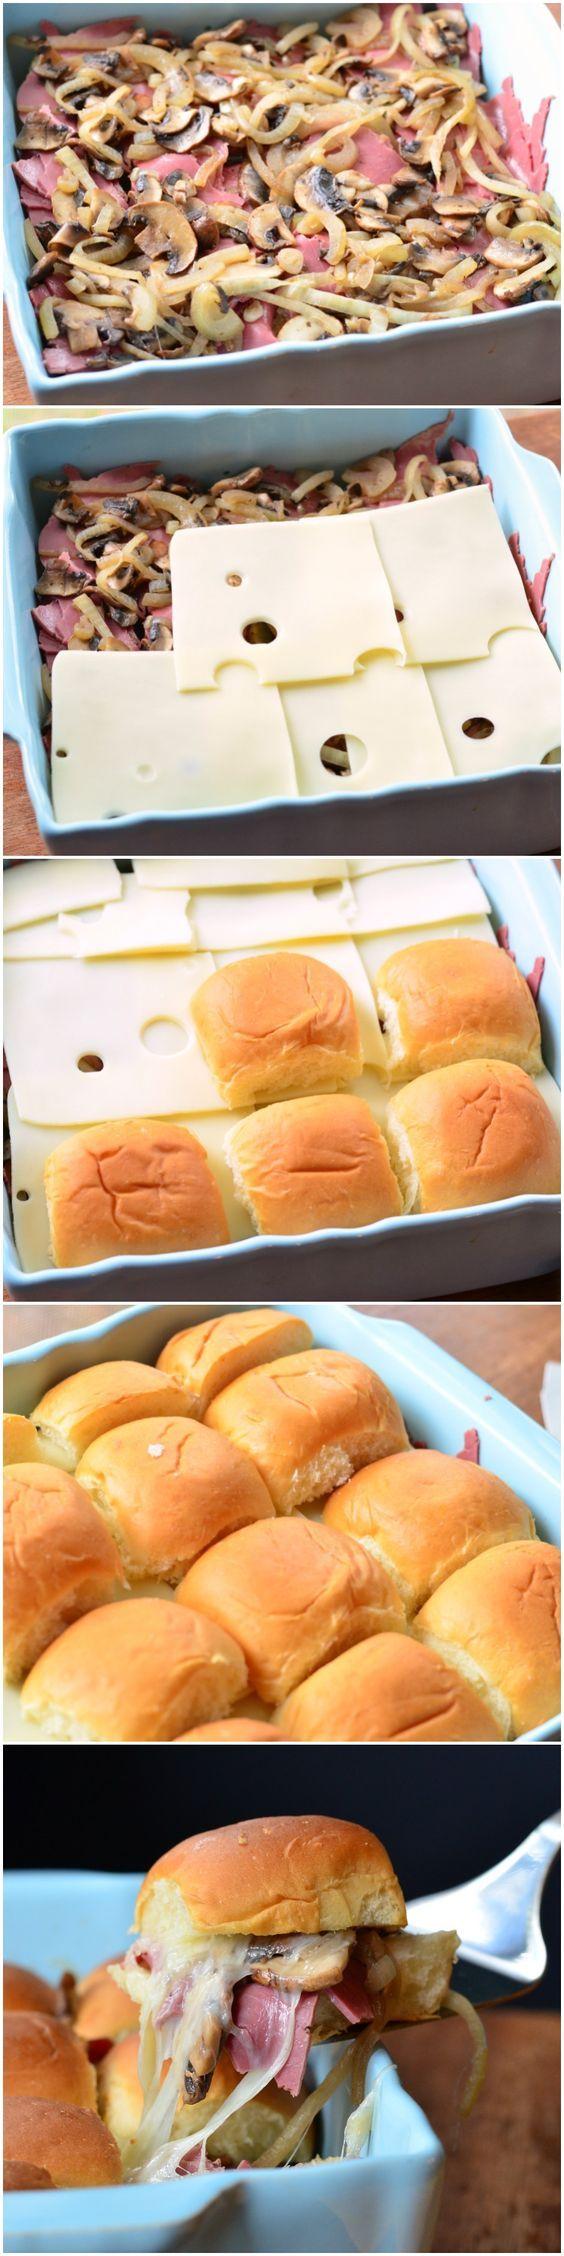 Baked Corned Beef Sliders | willcookforsmiles.com #cornedbeef #sandwich